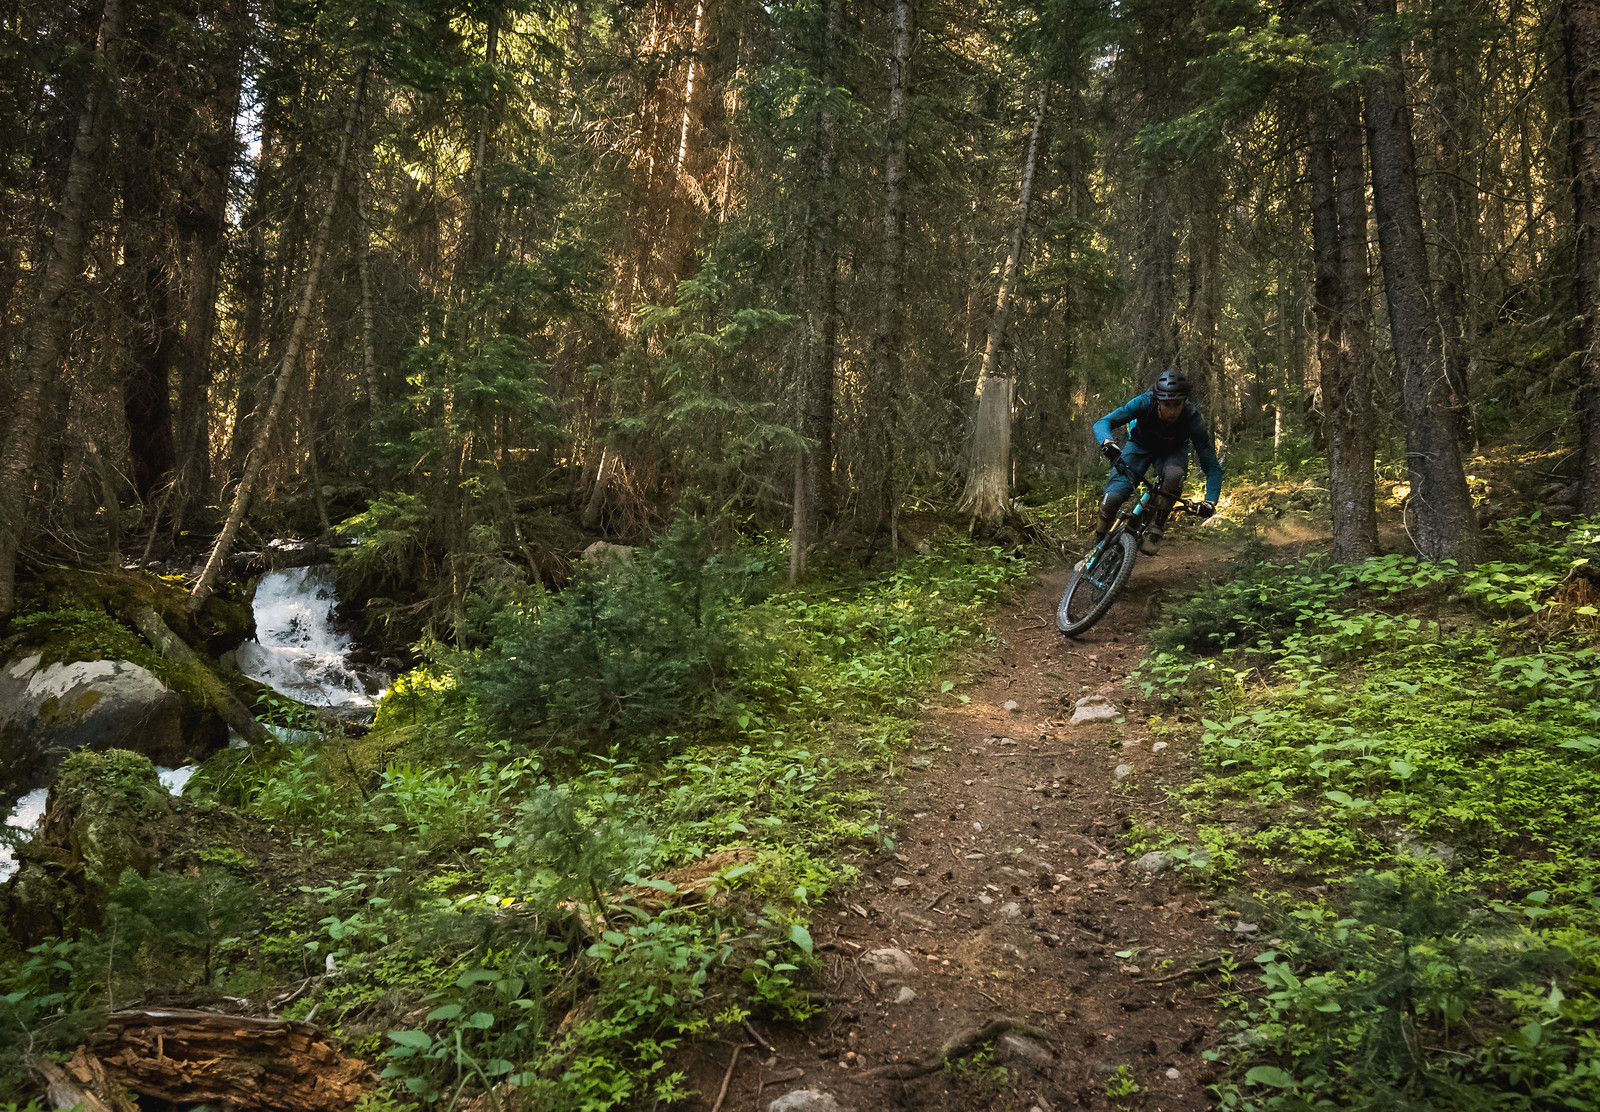 PJR 1839-2 - russellpj - Mountain Biking Pictures - Vital MTB